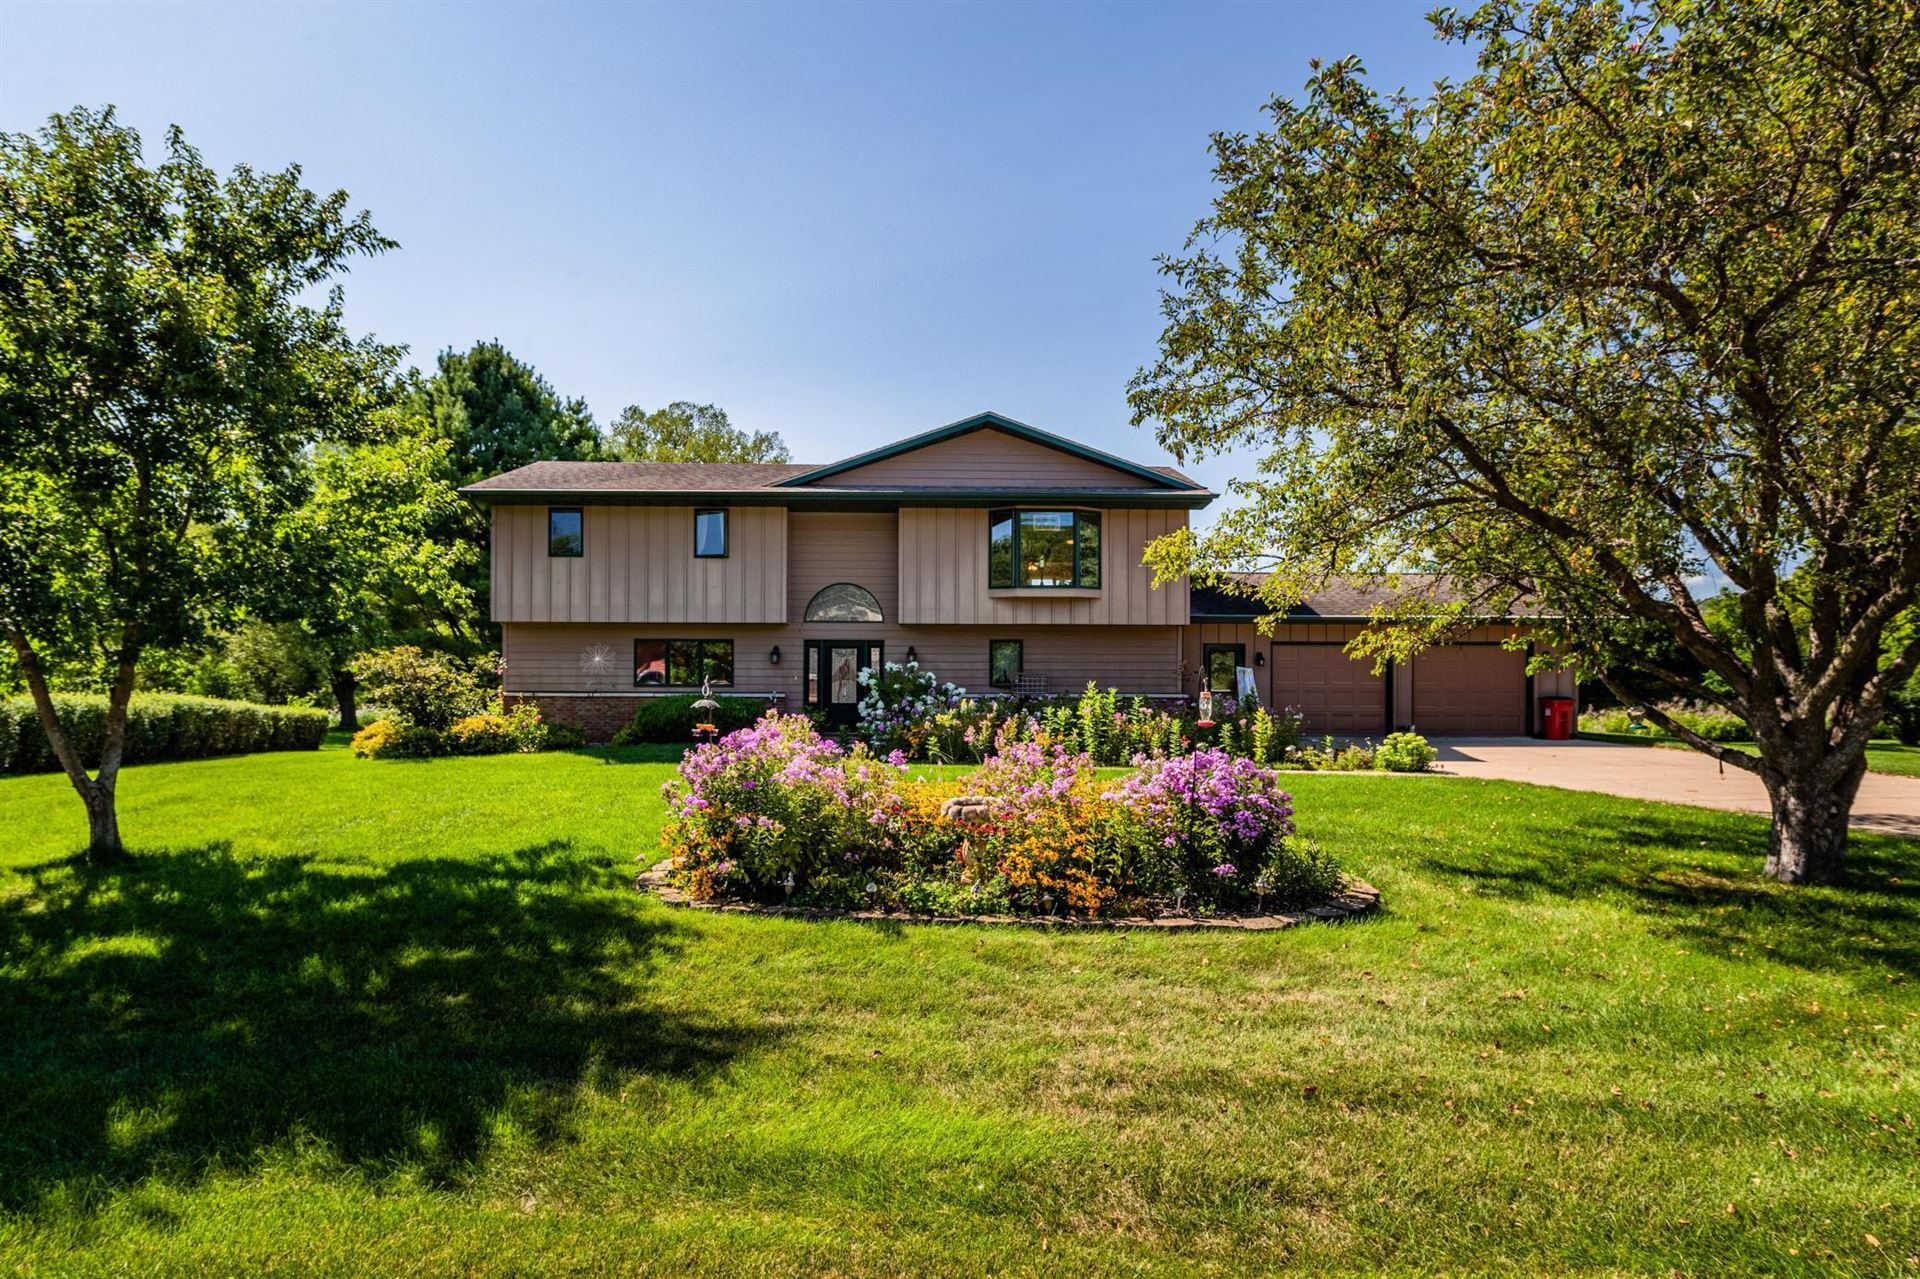 1265 Sherry Drive, Goodview, MN 55987 - MLS#: 6096260